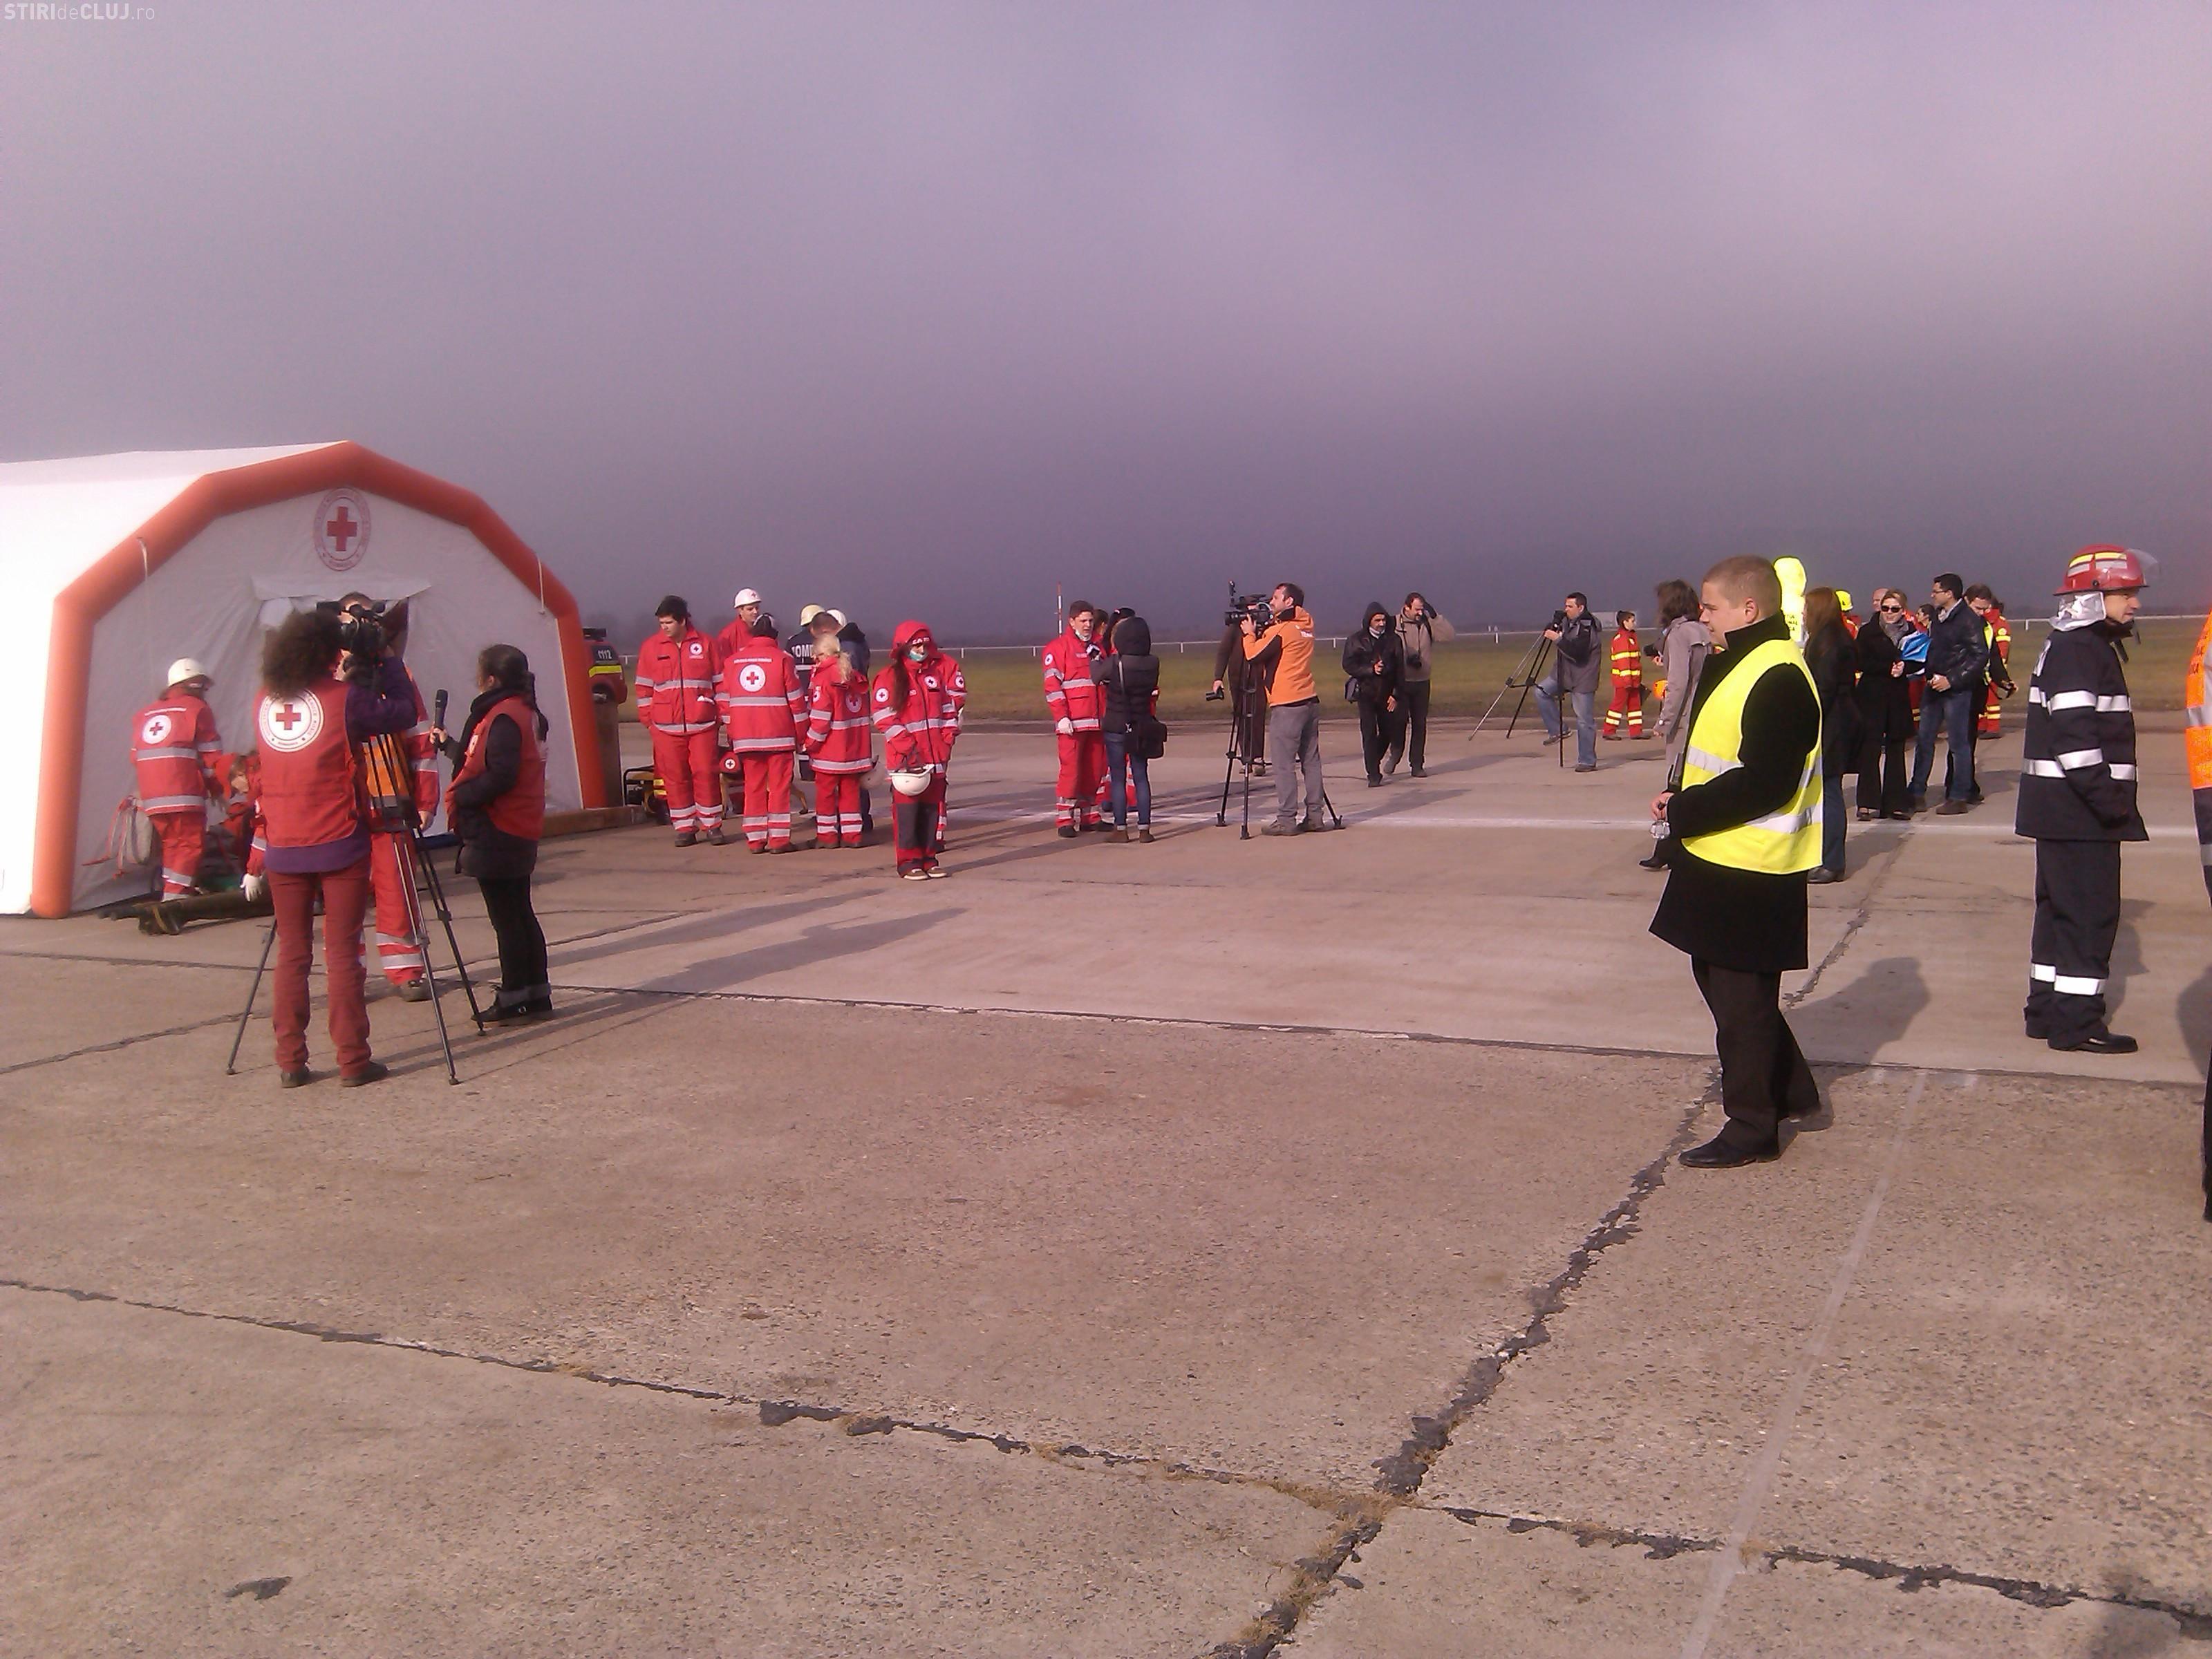 Exercițiu SPECTACULOS la Aeroportul Cluj! S-a simulat un accident aviatic - FOTO